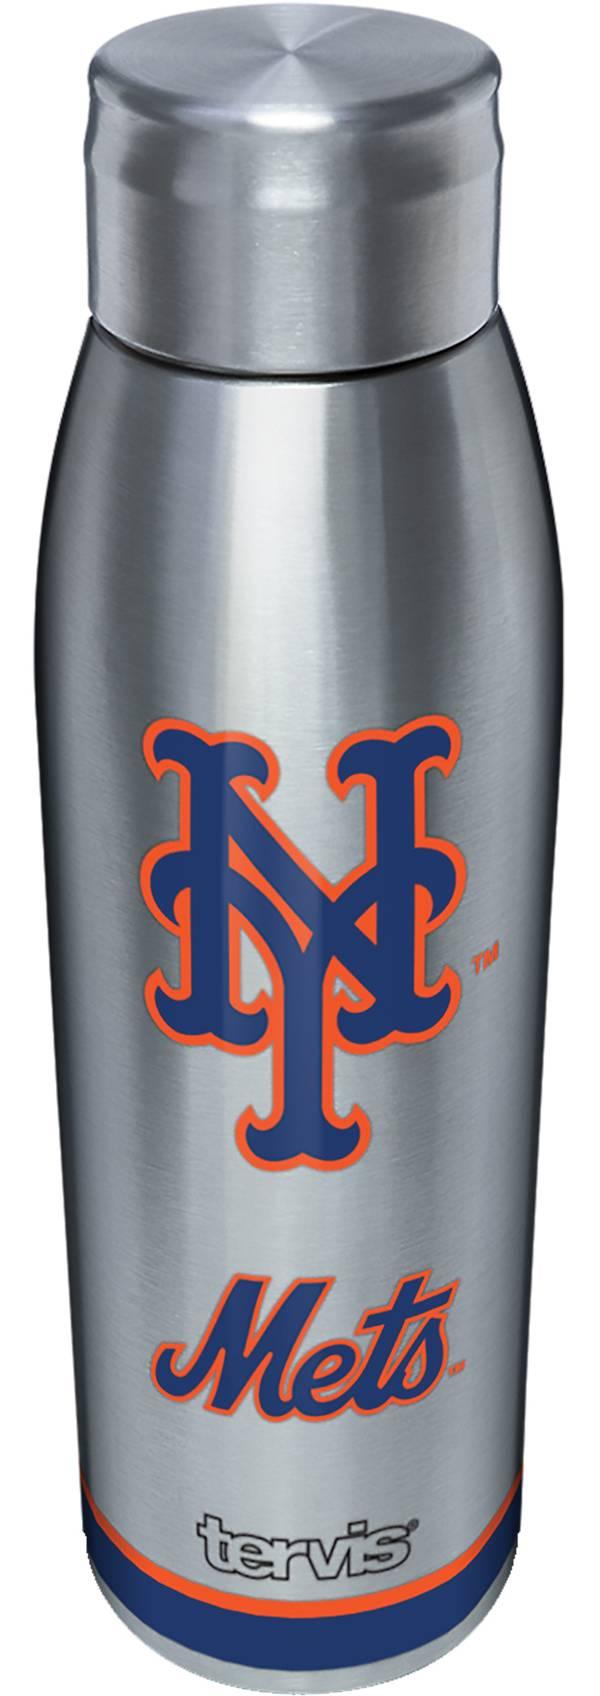 Tervis New York Mets 17oz. Water Bottle product image